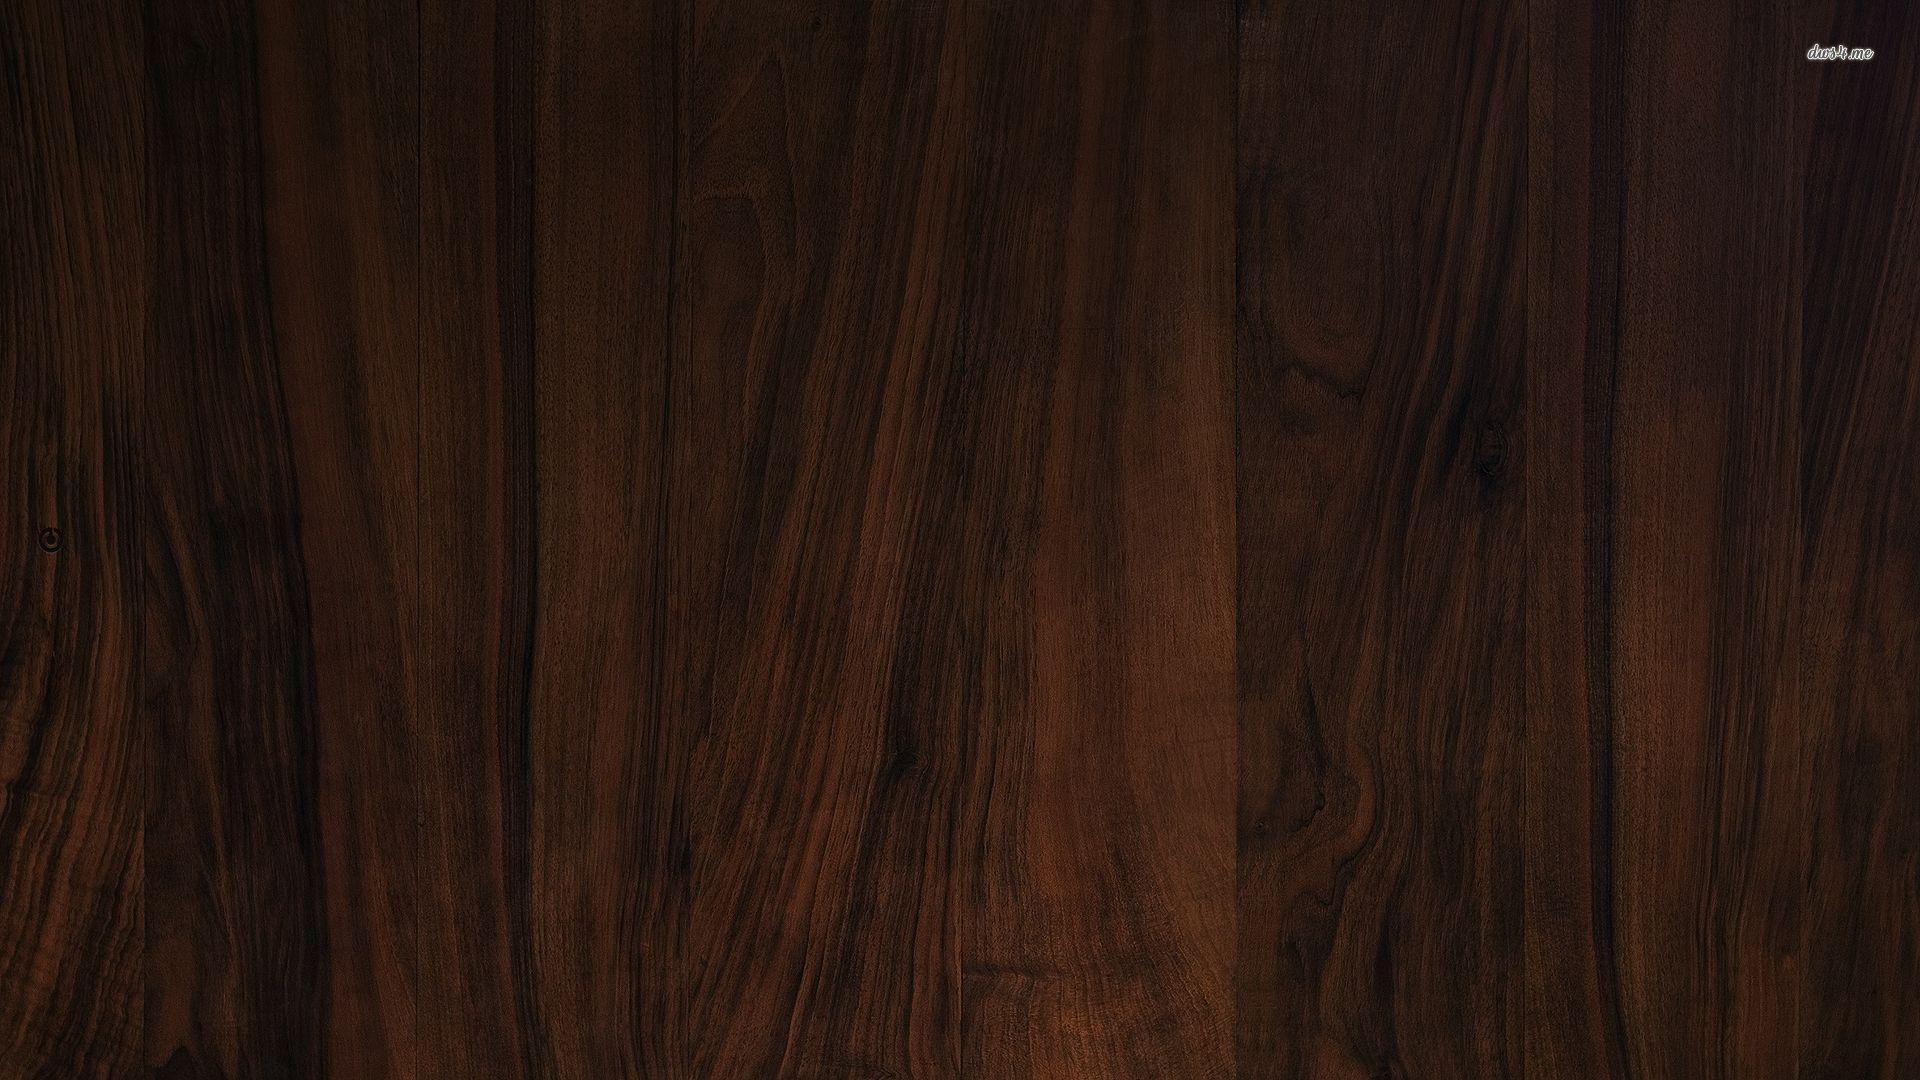 Mahogany wallpapers wallpaper cave - Dark wood wallpaper ...